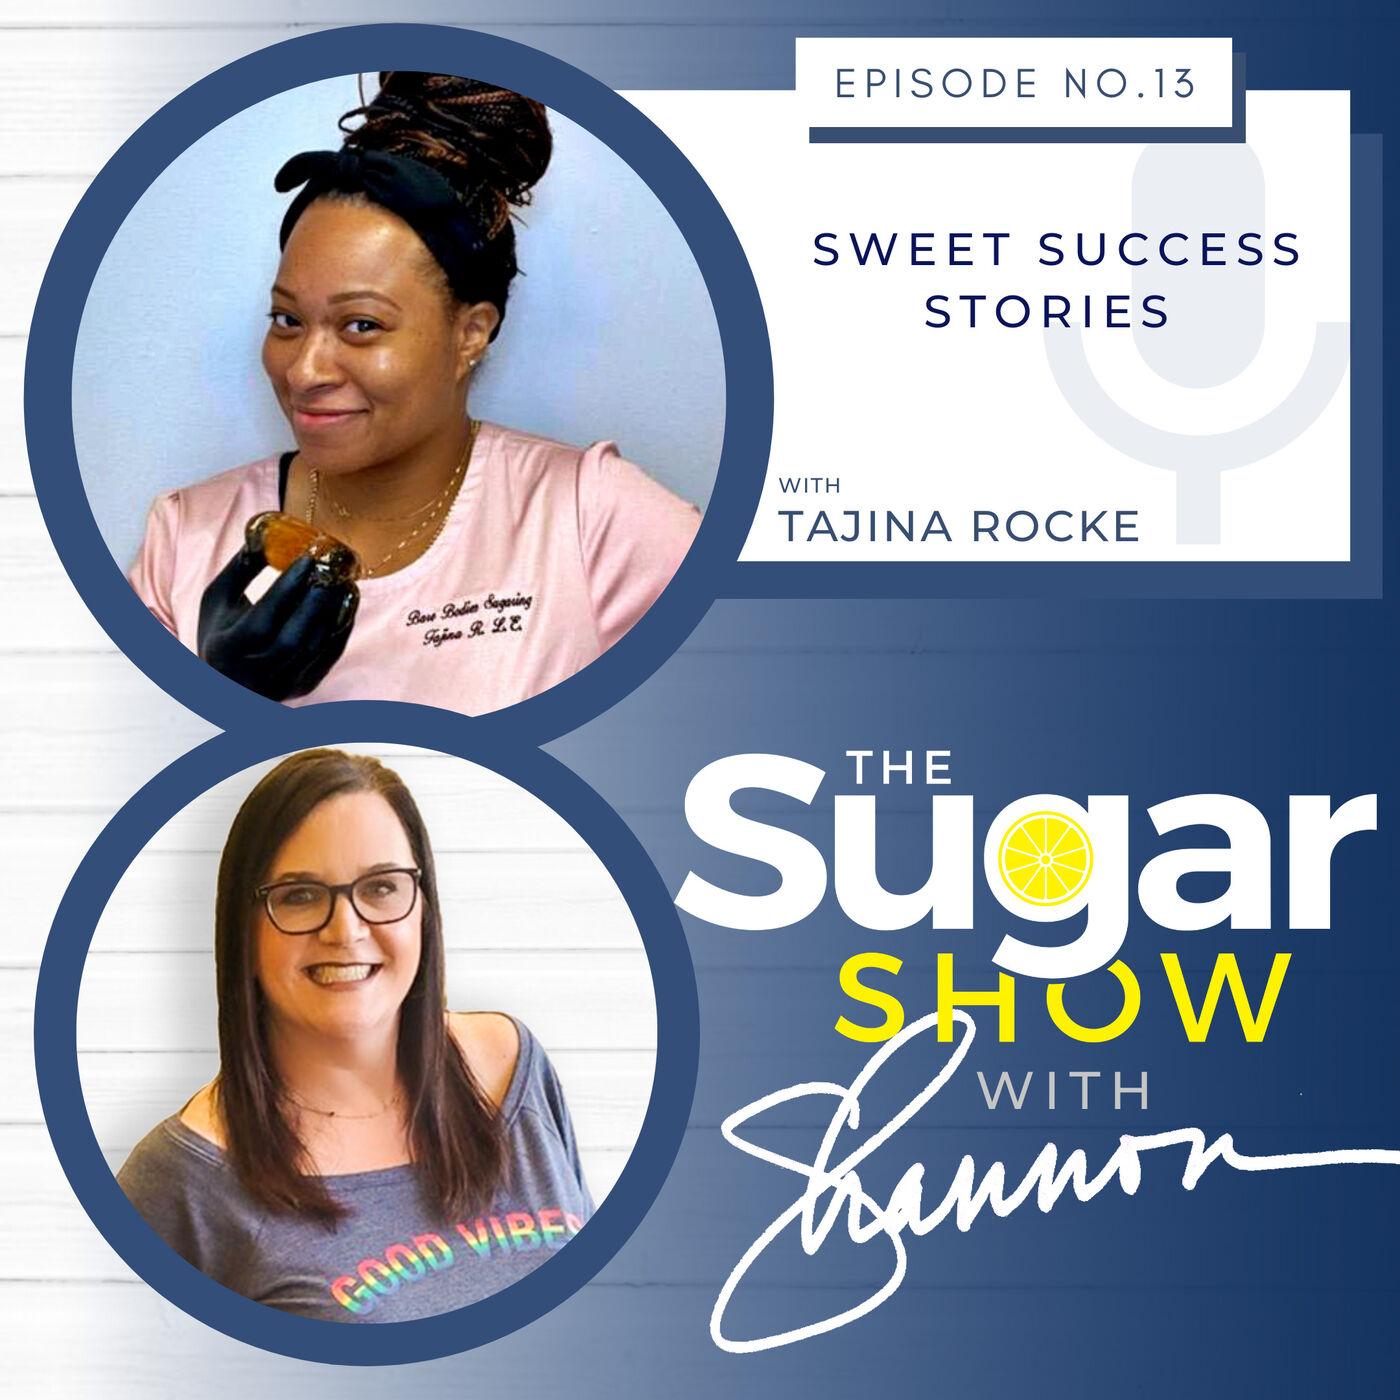 The SugarShow - Sweet Success Stories: Tajina Rocke